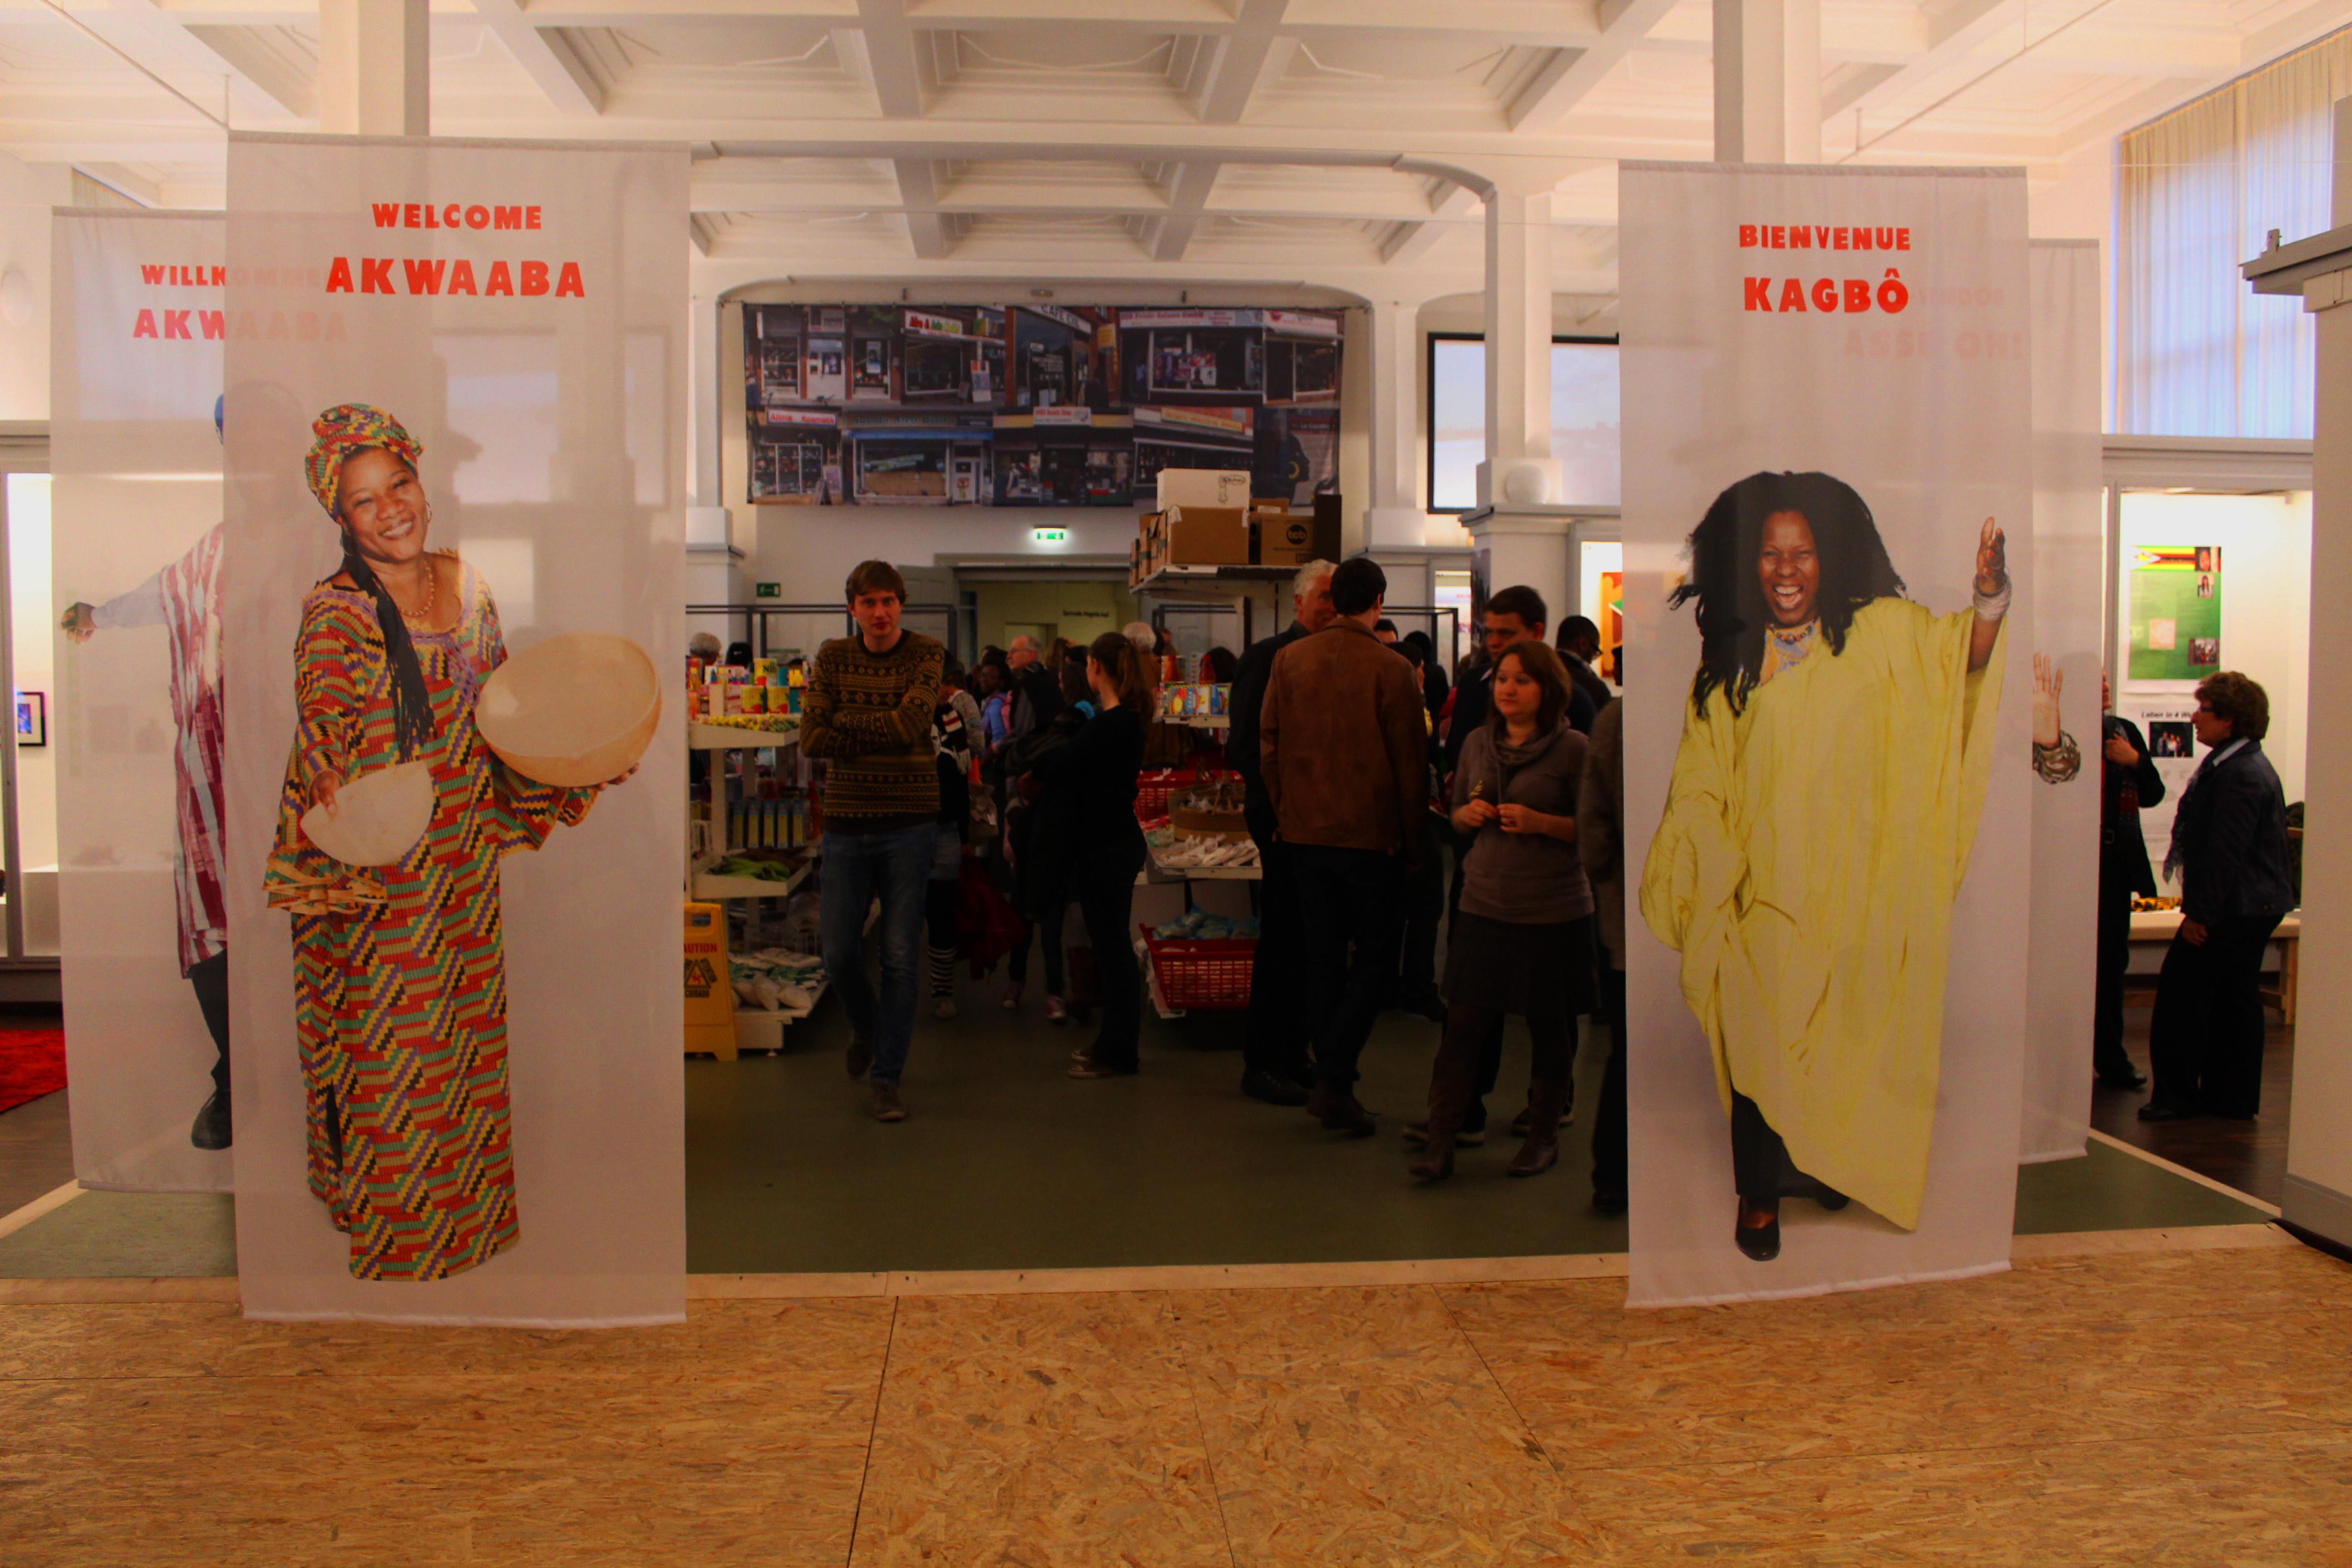 ausstellung afrikaner in hamburg im v lkerkundemuseum globushamburg. Black Bedroom Furniture Sets. Home Design Ideas